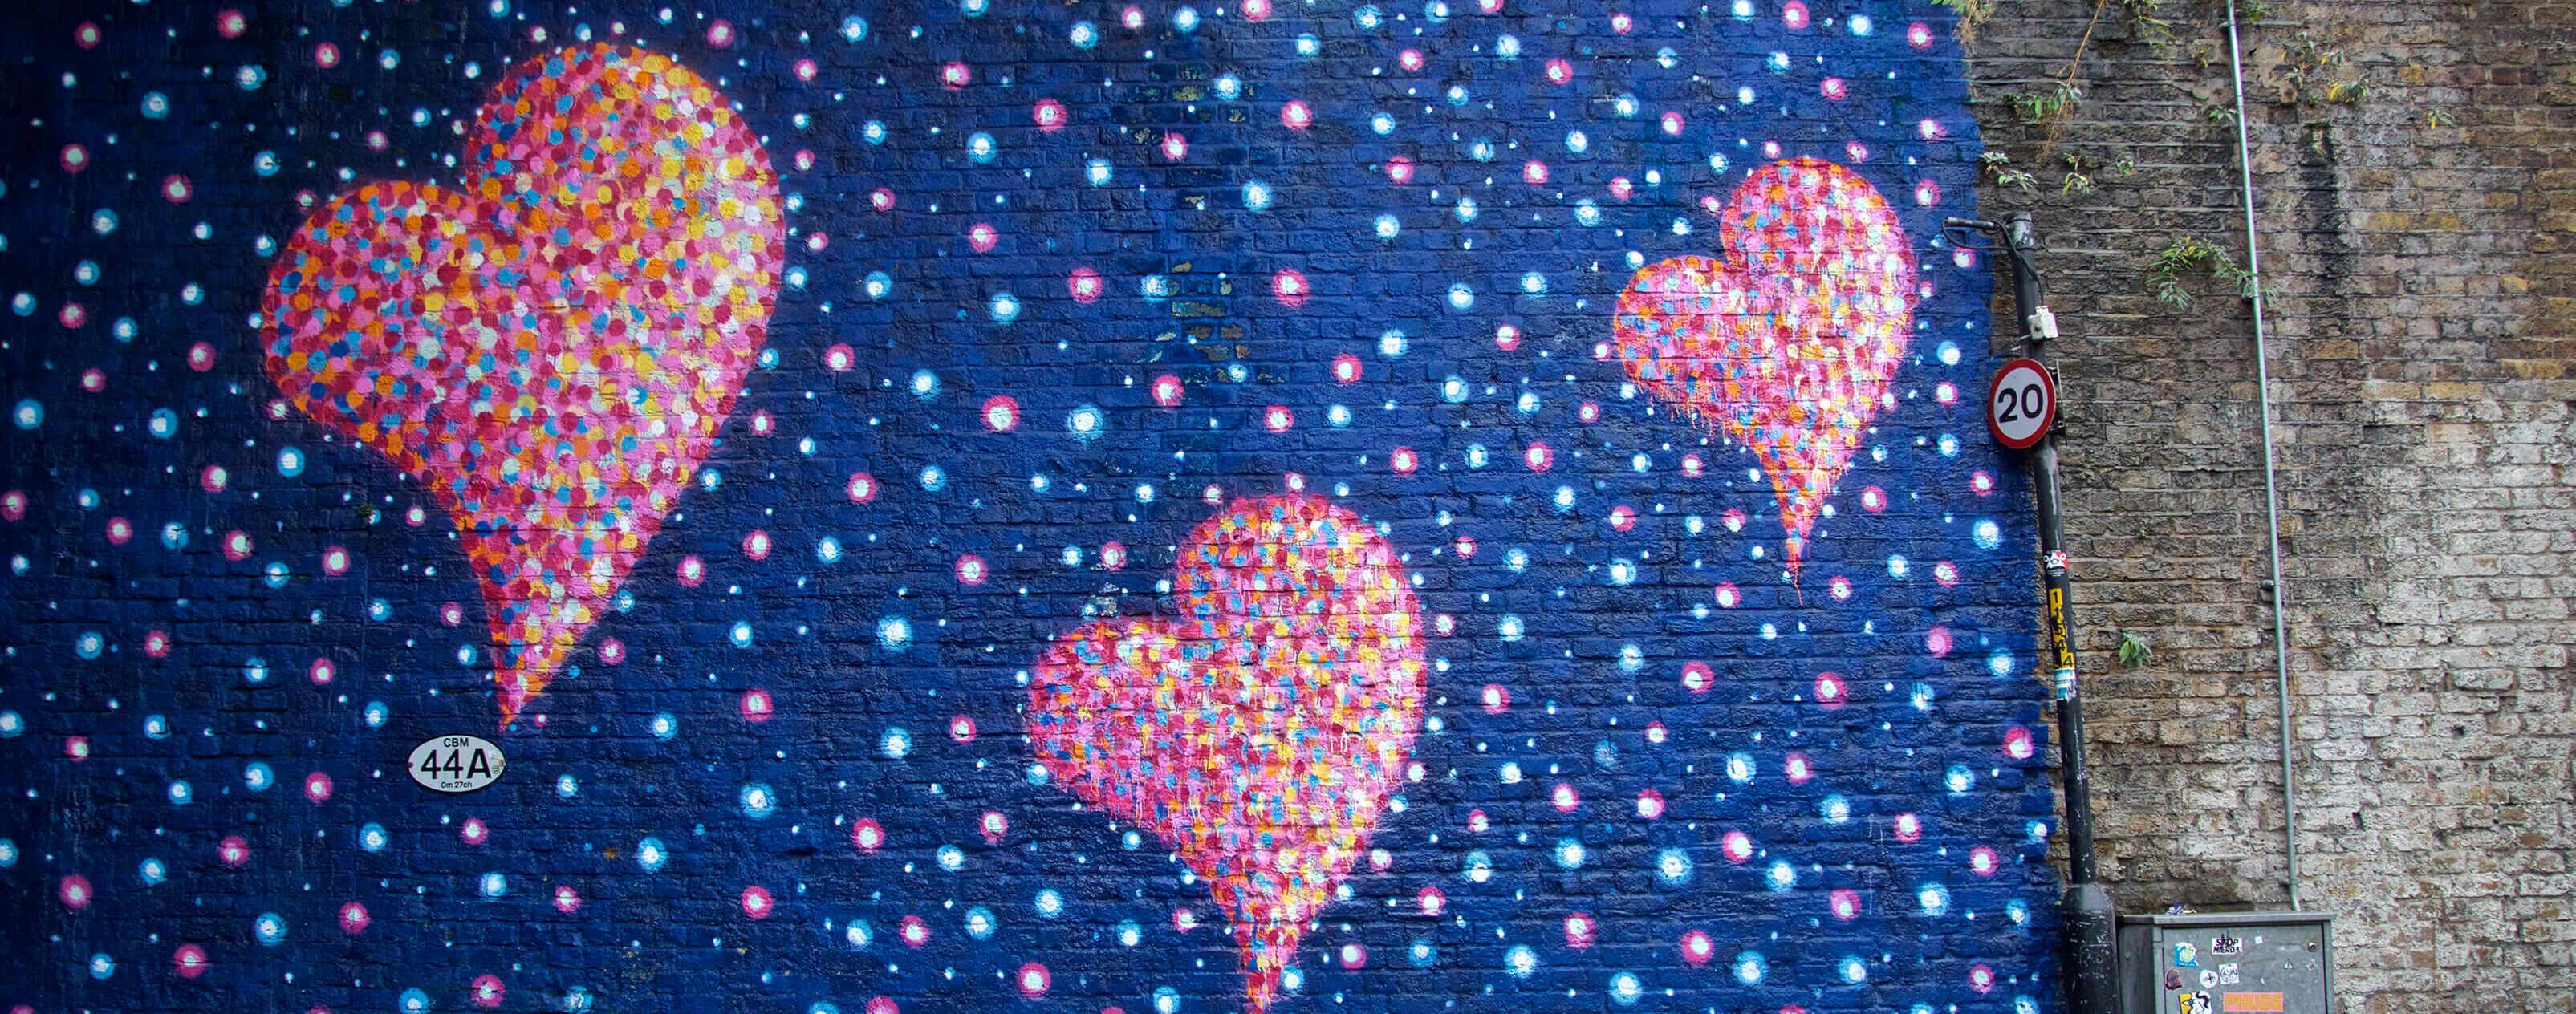 wall of graffiti hearts